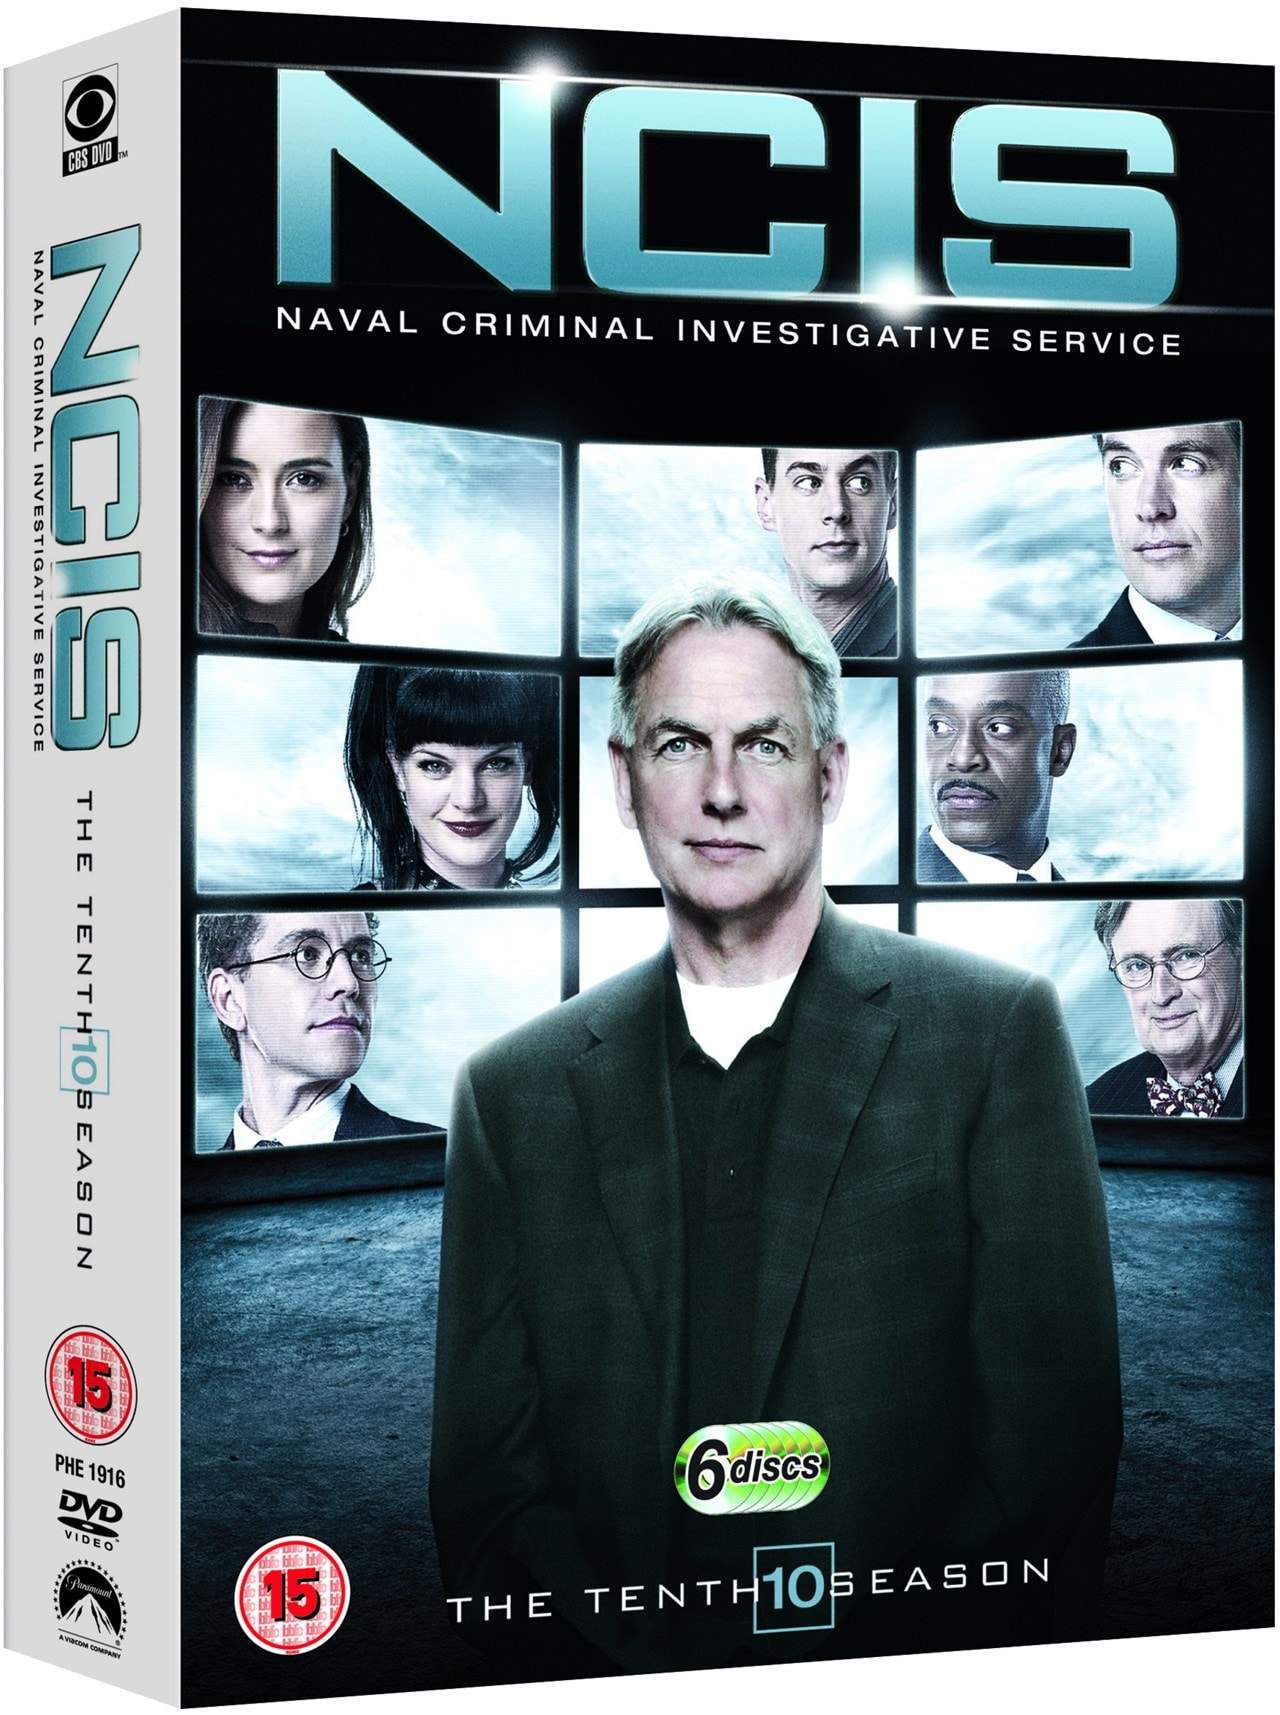 NCIS: The Tenth Season - 2